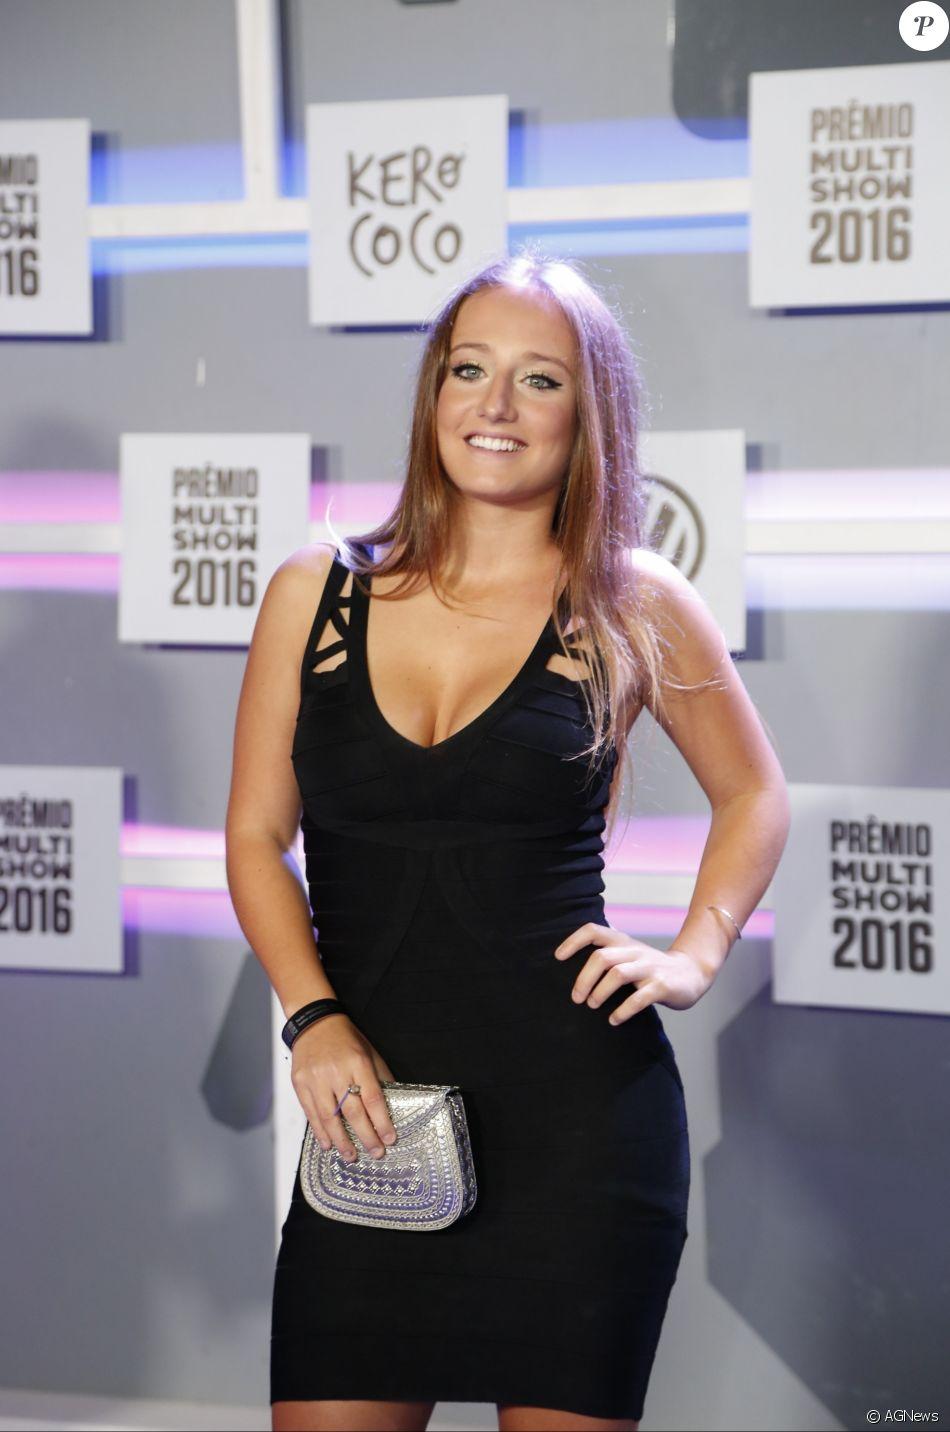 Hot Bruna Griphao naked (12 photo), Pussy, Bikini, Twitter, panties 2017